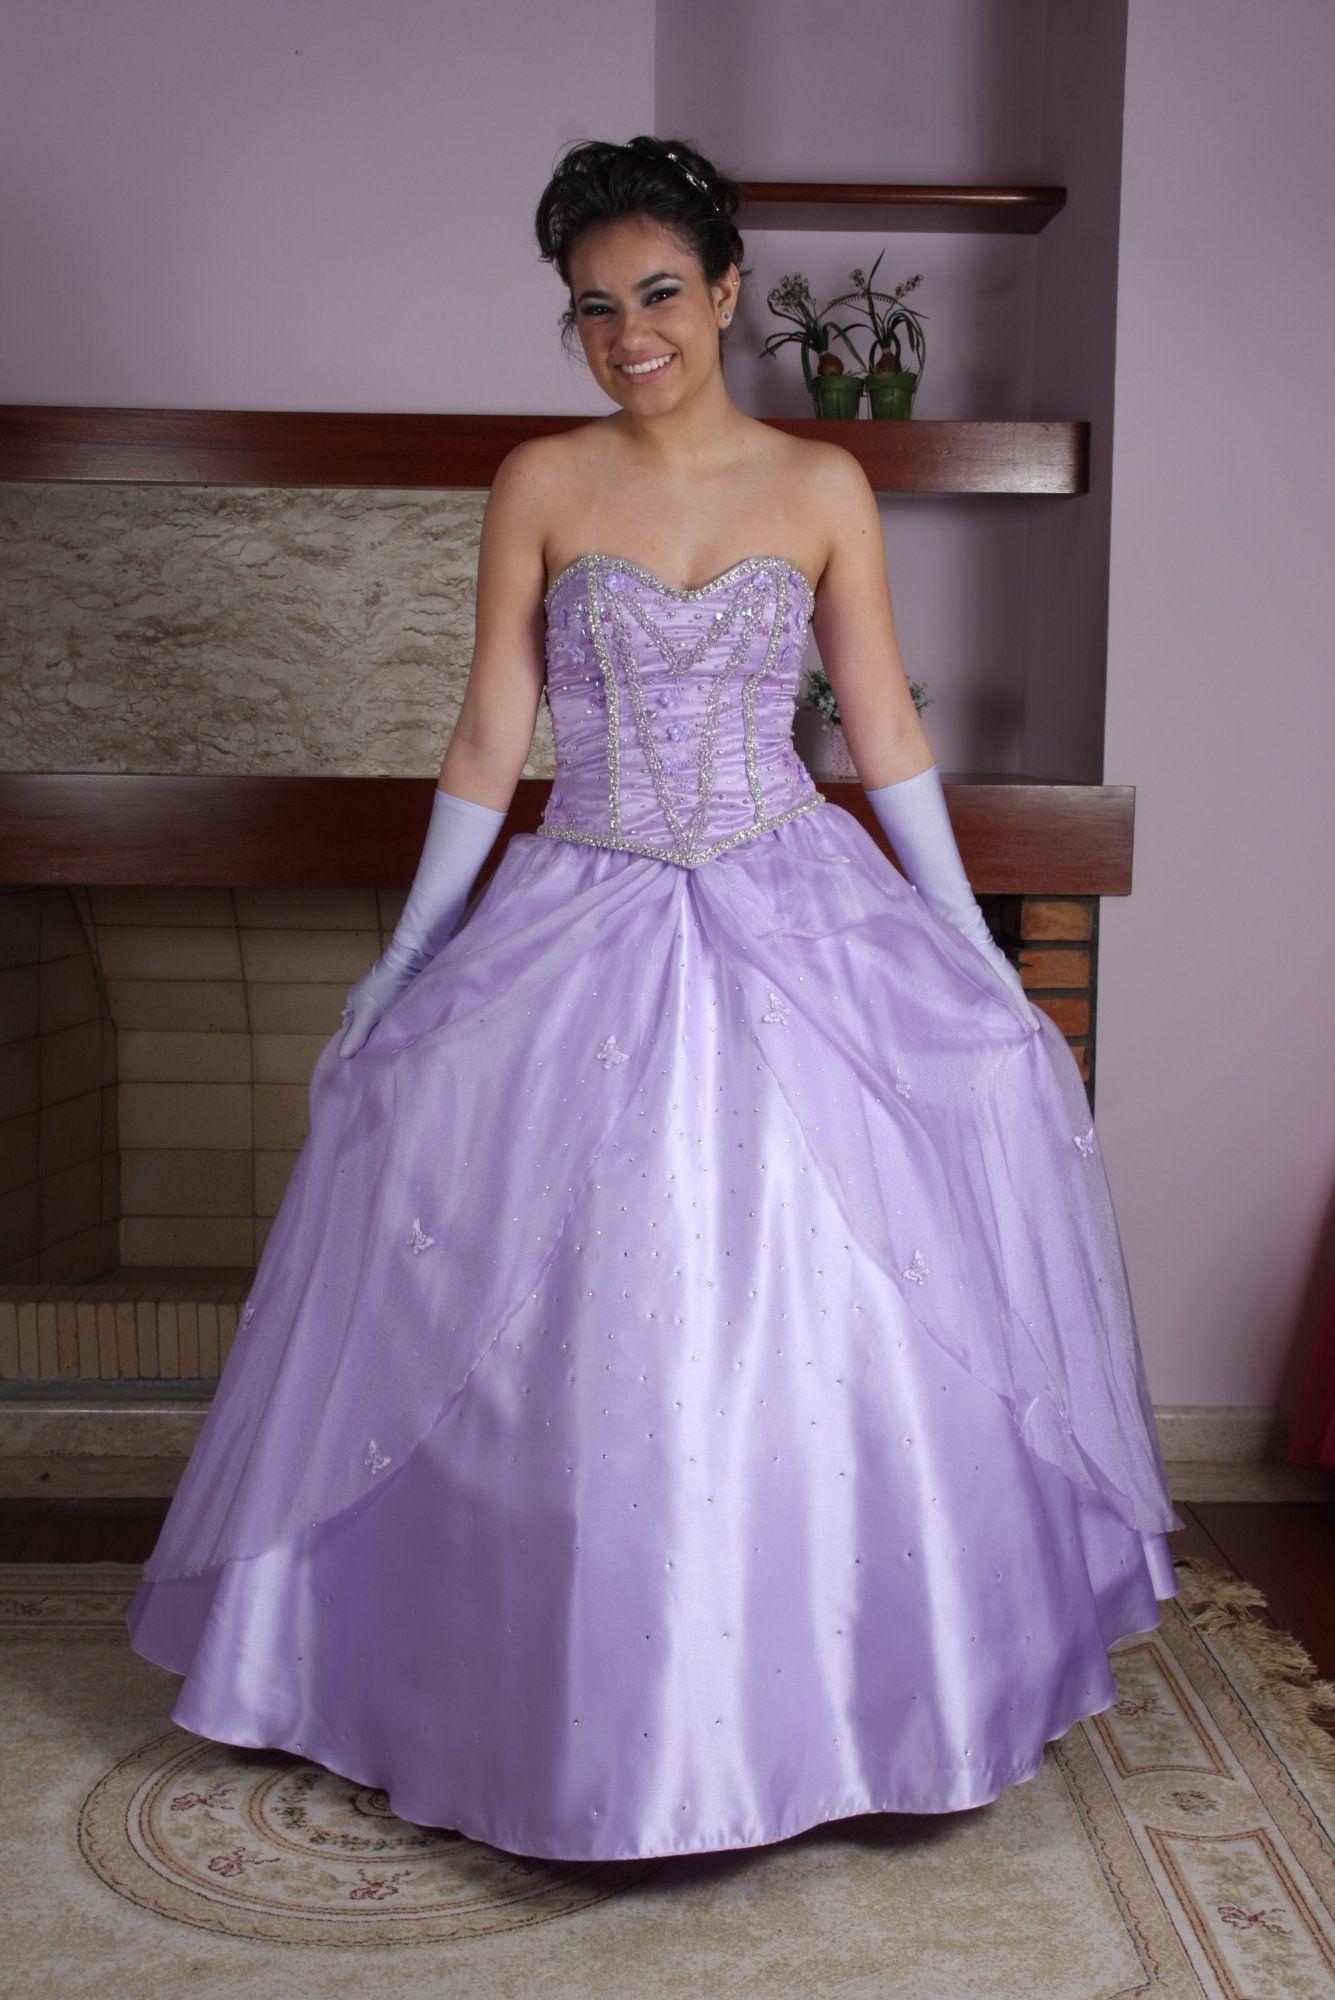 Vestido de Debutante Lilas - 5 - Hipnose Alta Costura e Spa para Noivas e Noivos - Campinas - SP Vestido de Debutante, Vestido de Debutante Lilas, Hipnose Alta Costura